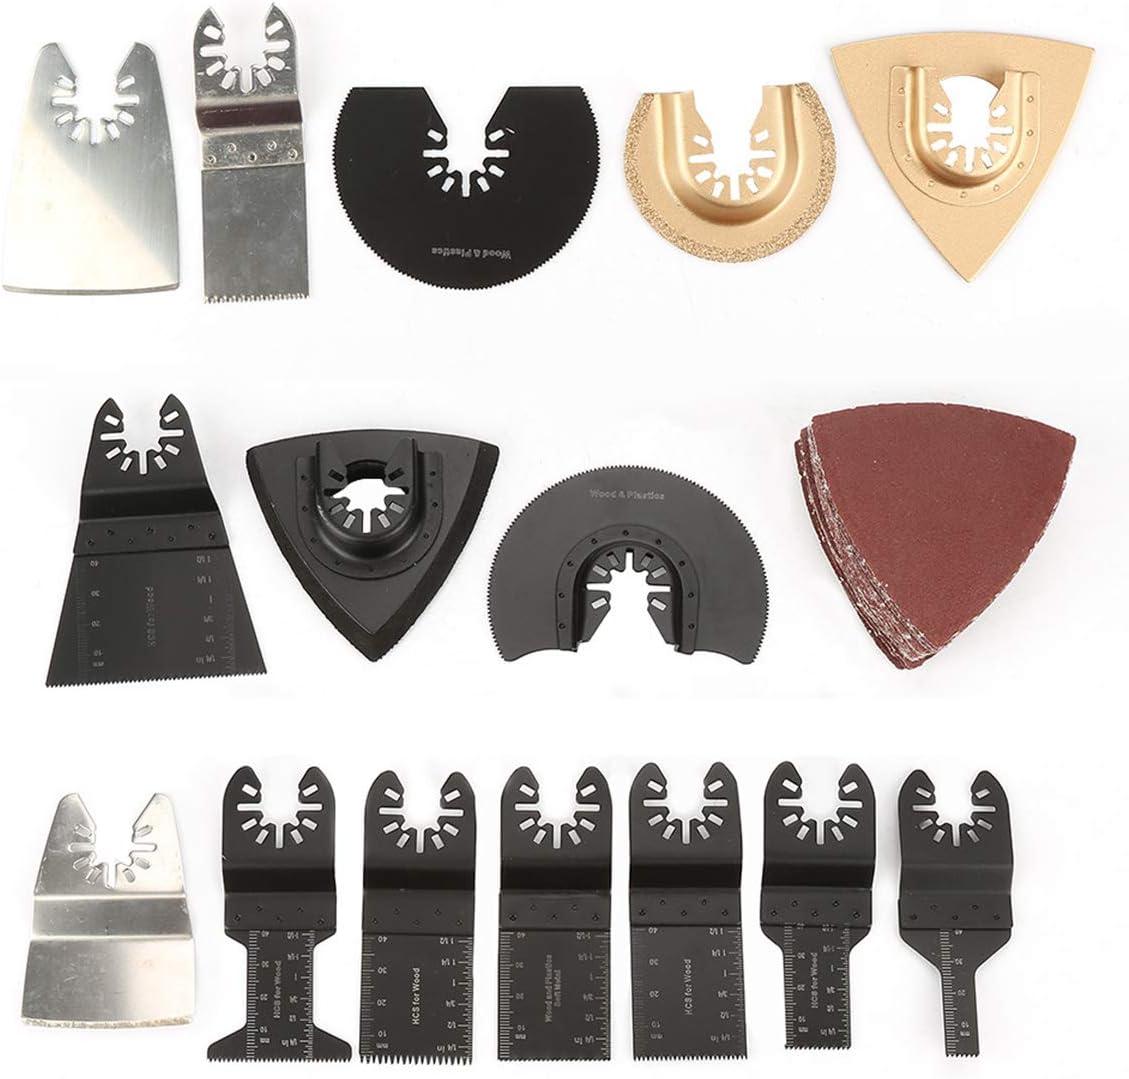 set Hoja de sierra oscilante Kit de herramientas m/últiples Kit de sierra oscilante multifuncional Kit web Herramientas el/éctricas Reparaci/ón de accesorios de m/áquina 40pcs